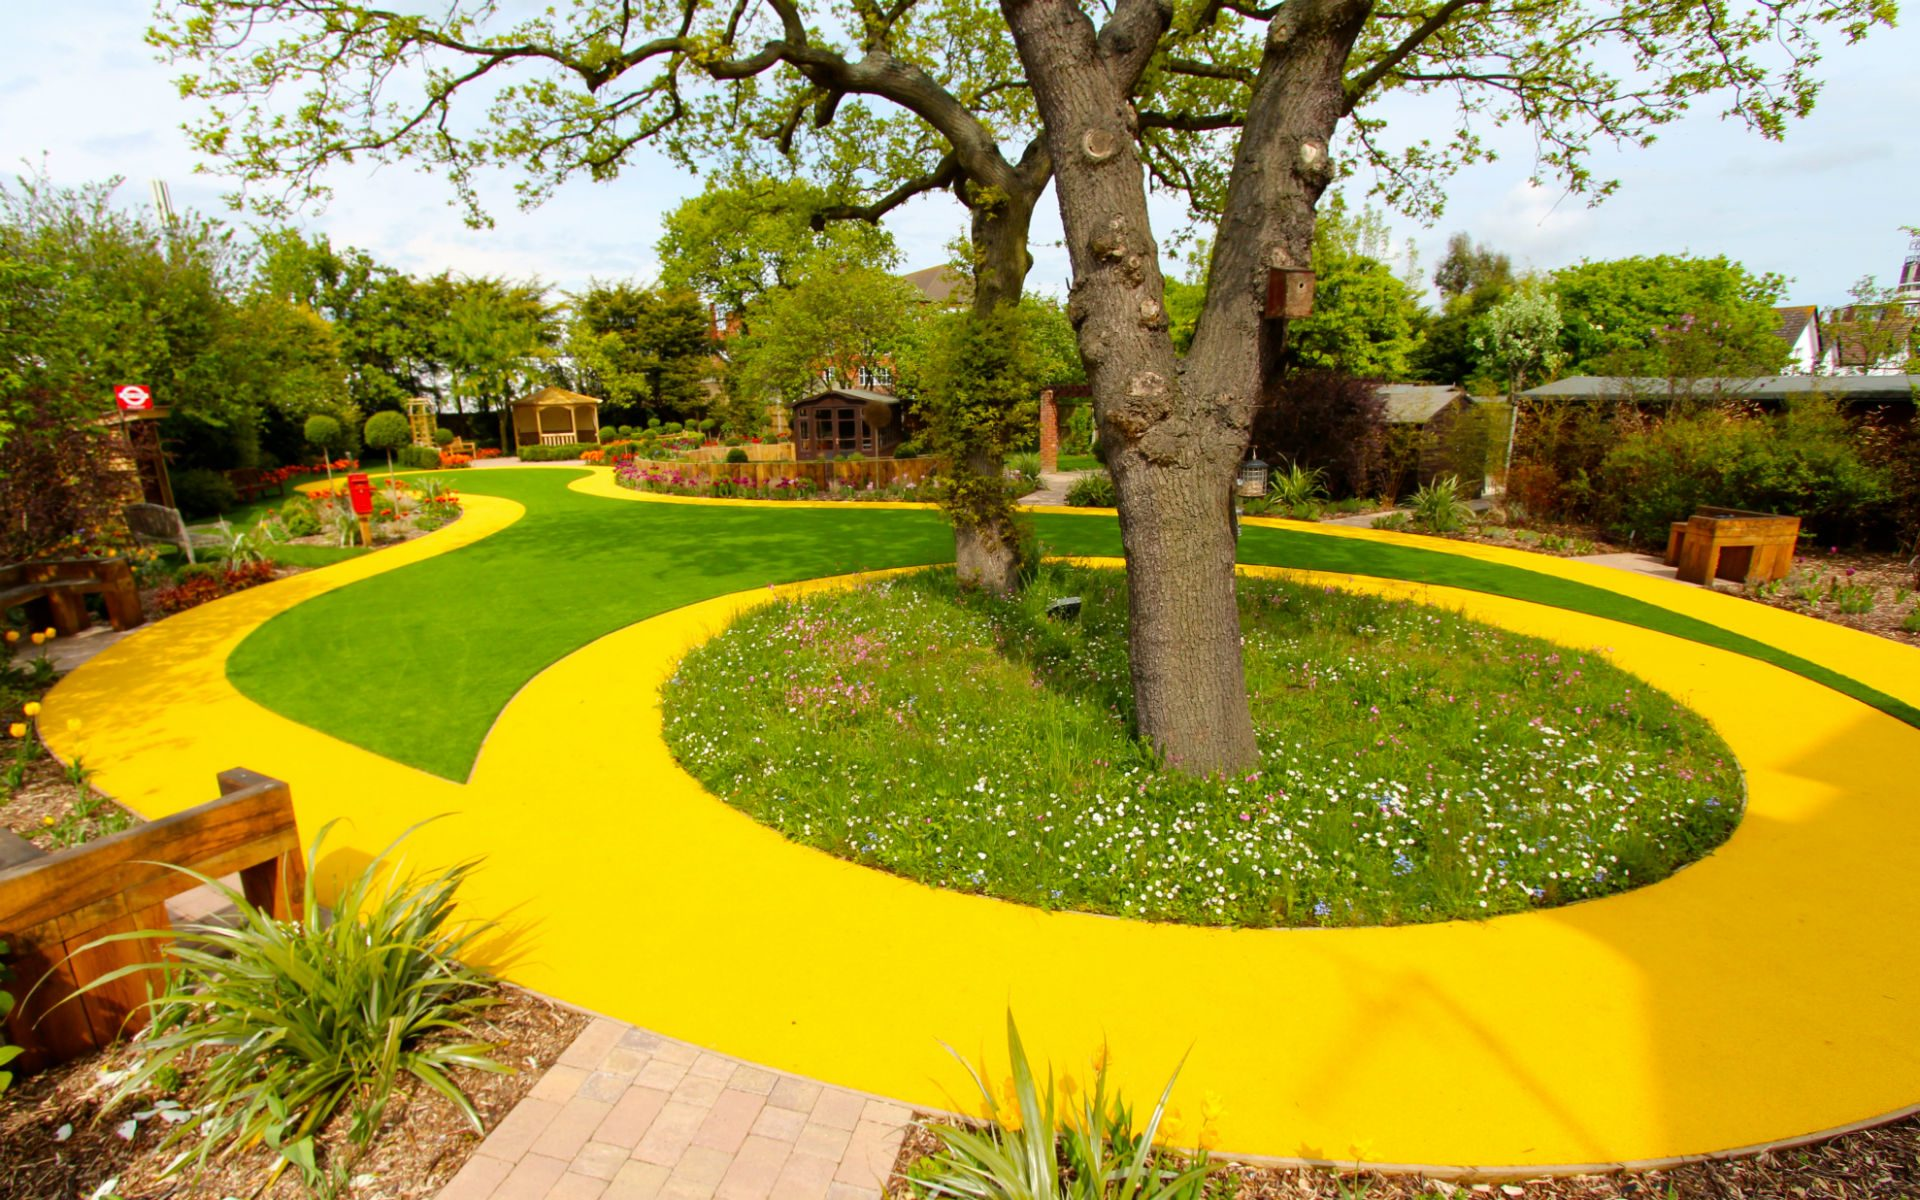 BALI Award Winning Sensory Dementia Garden Westcliff-on-Sea Essex Figure of Eight Path Meadow Turf